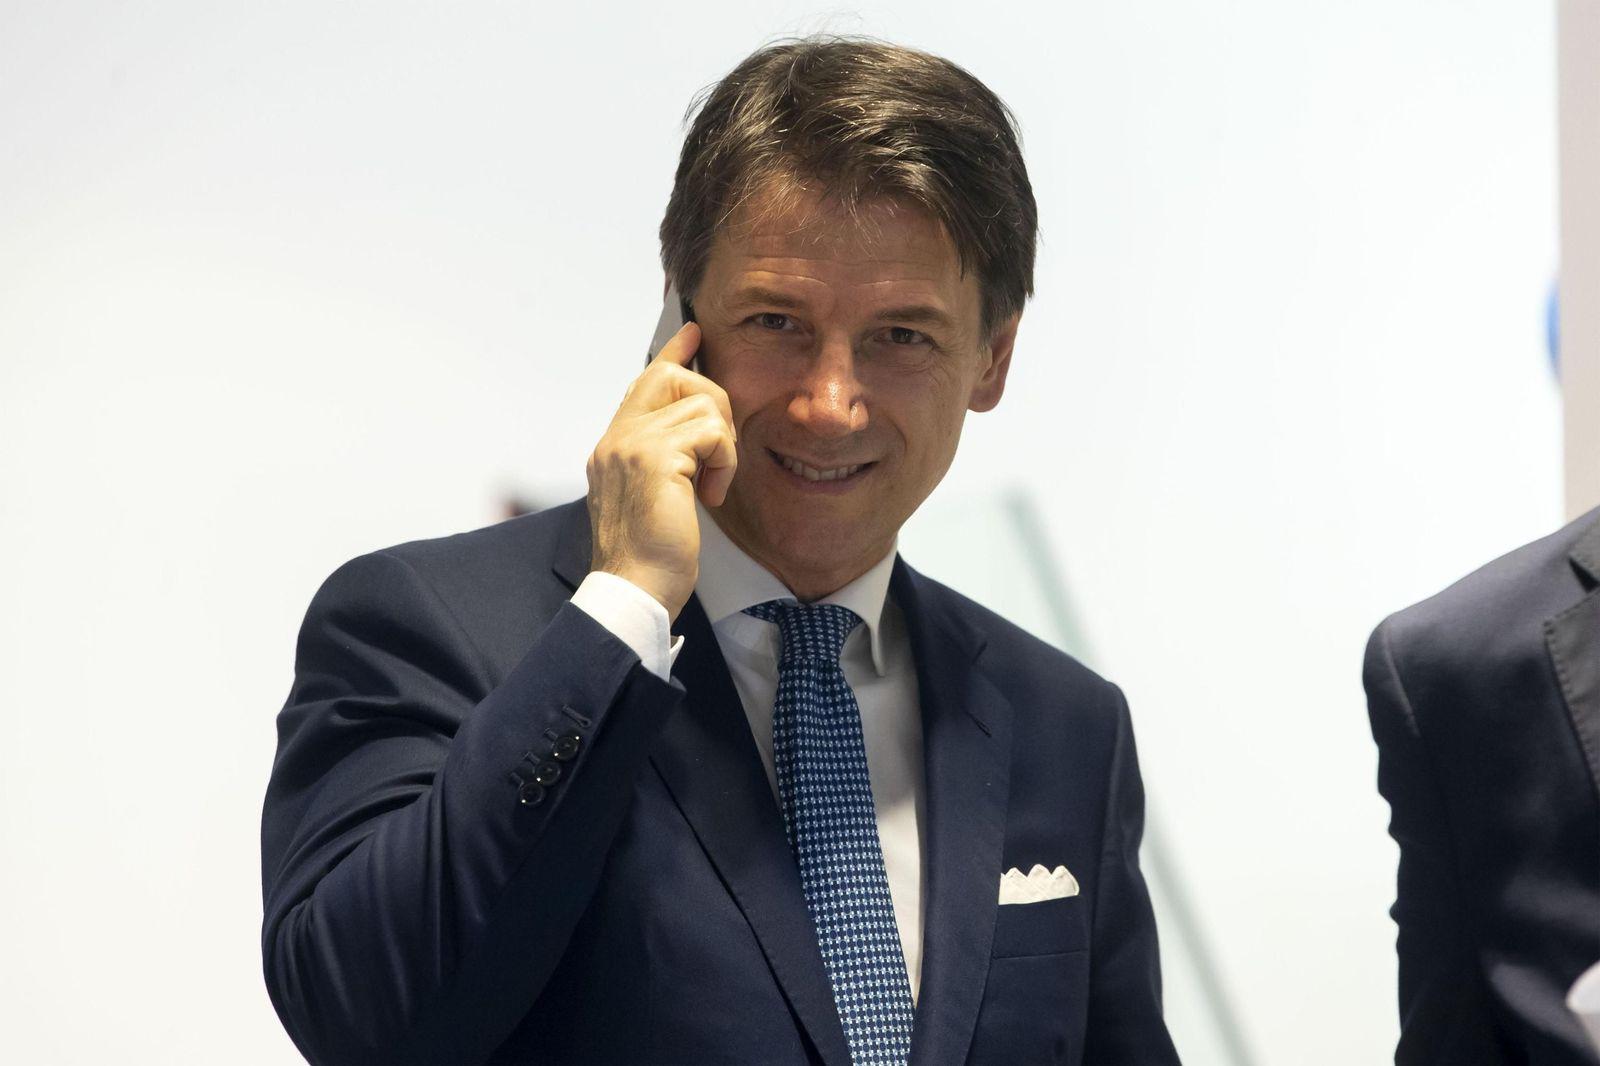 Italy Politics